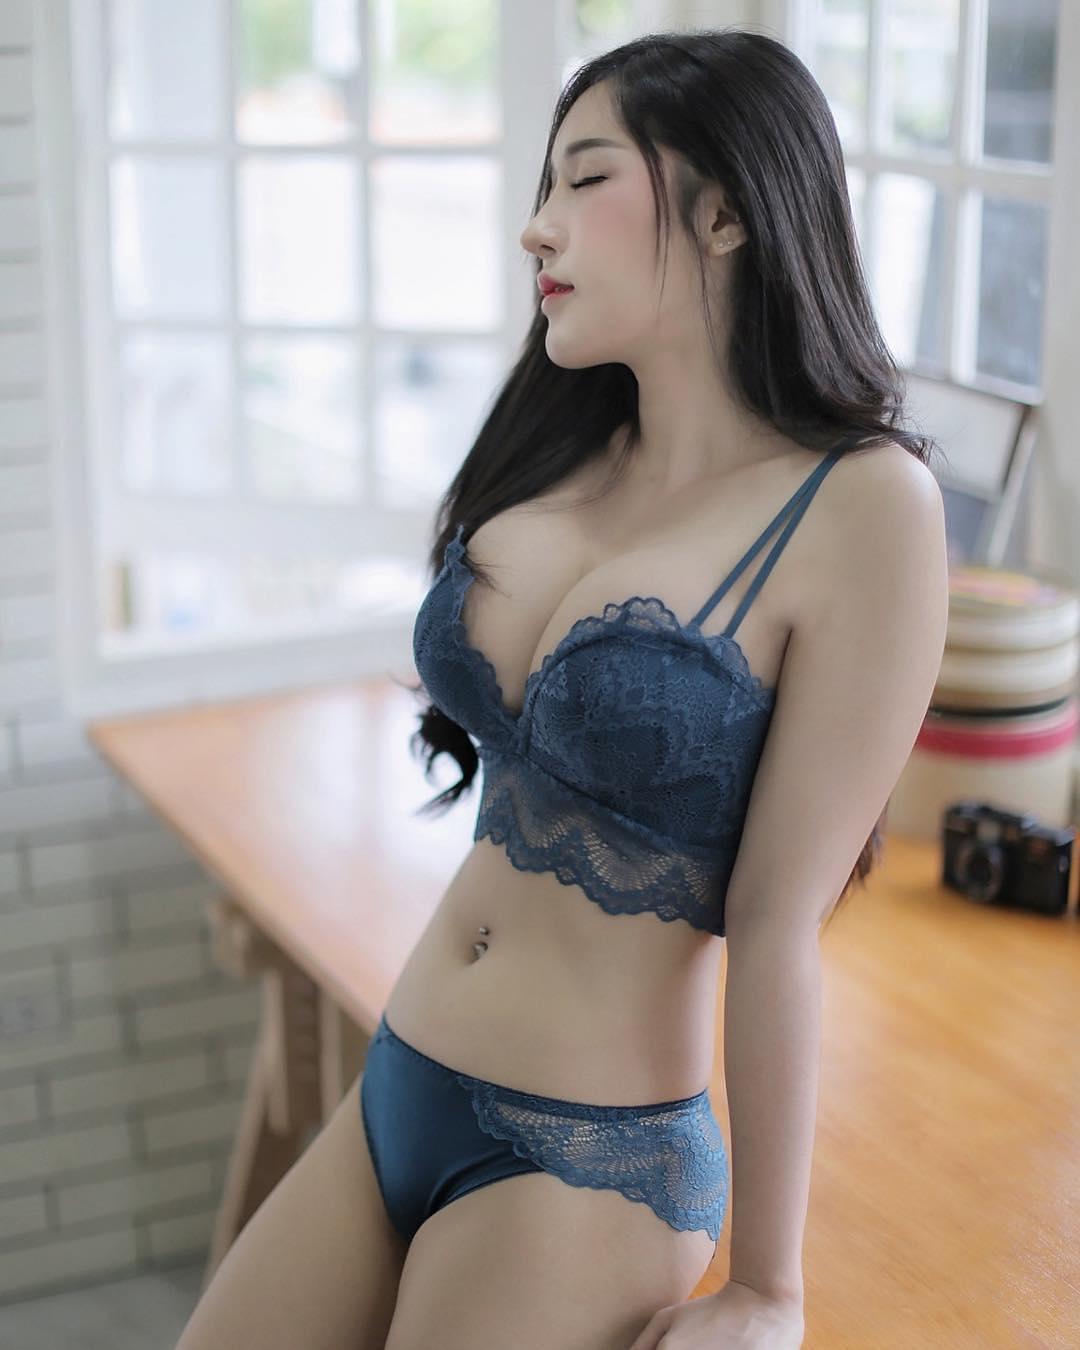 Cerita Sex Vony Gadis Cantik Teman Kantor Yang Punya Libido Tinggi